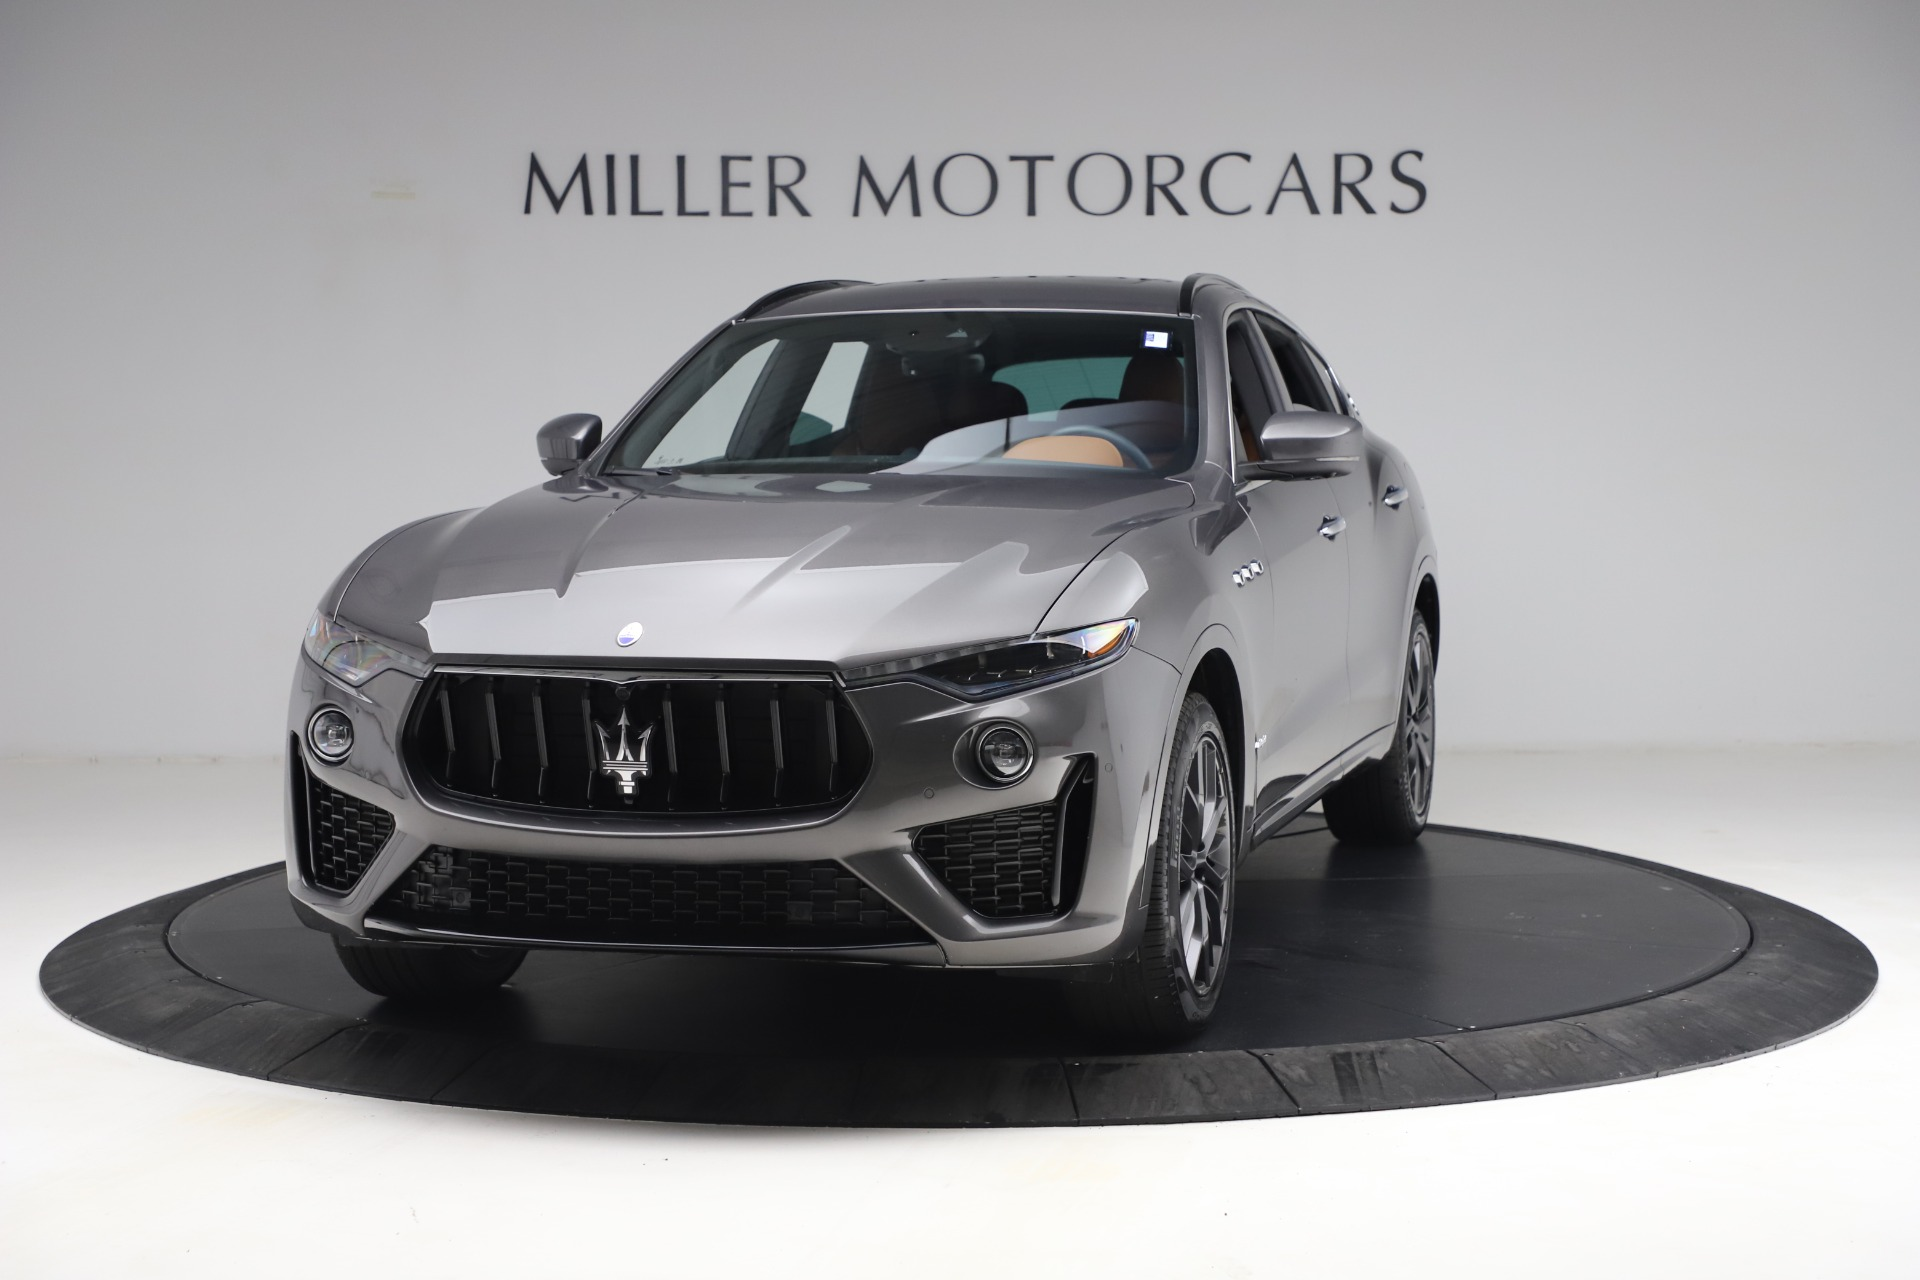 New 2021 Maserati Levante GranSport for sale $77,900 at McLaren Greenwich in Greenwich CT 06830 1